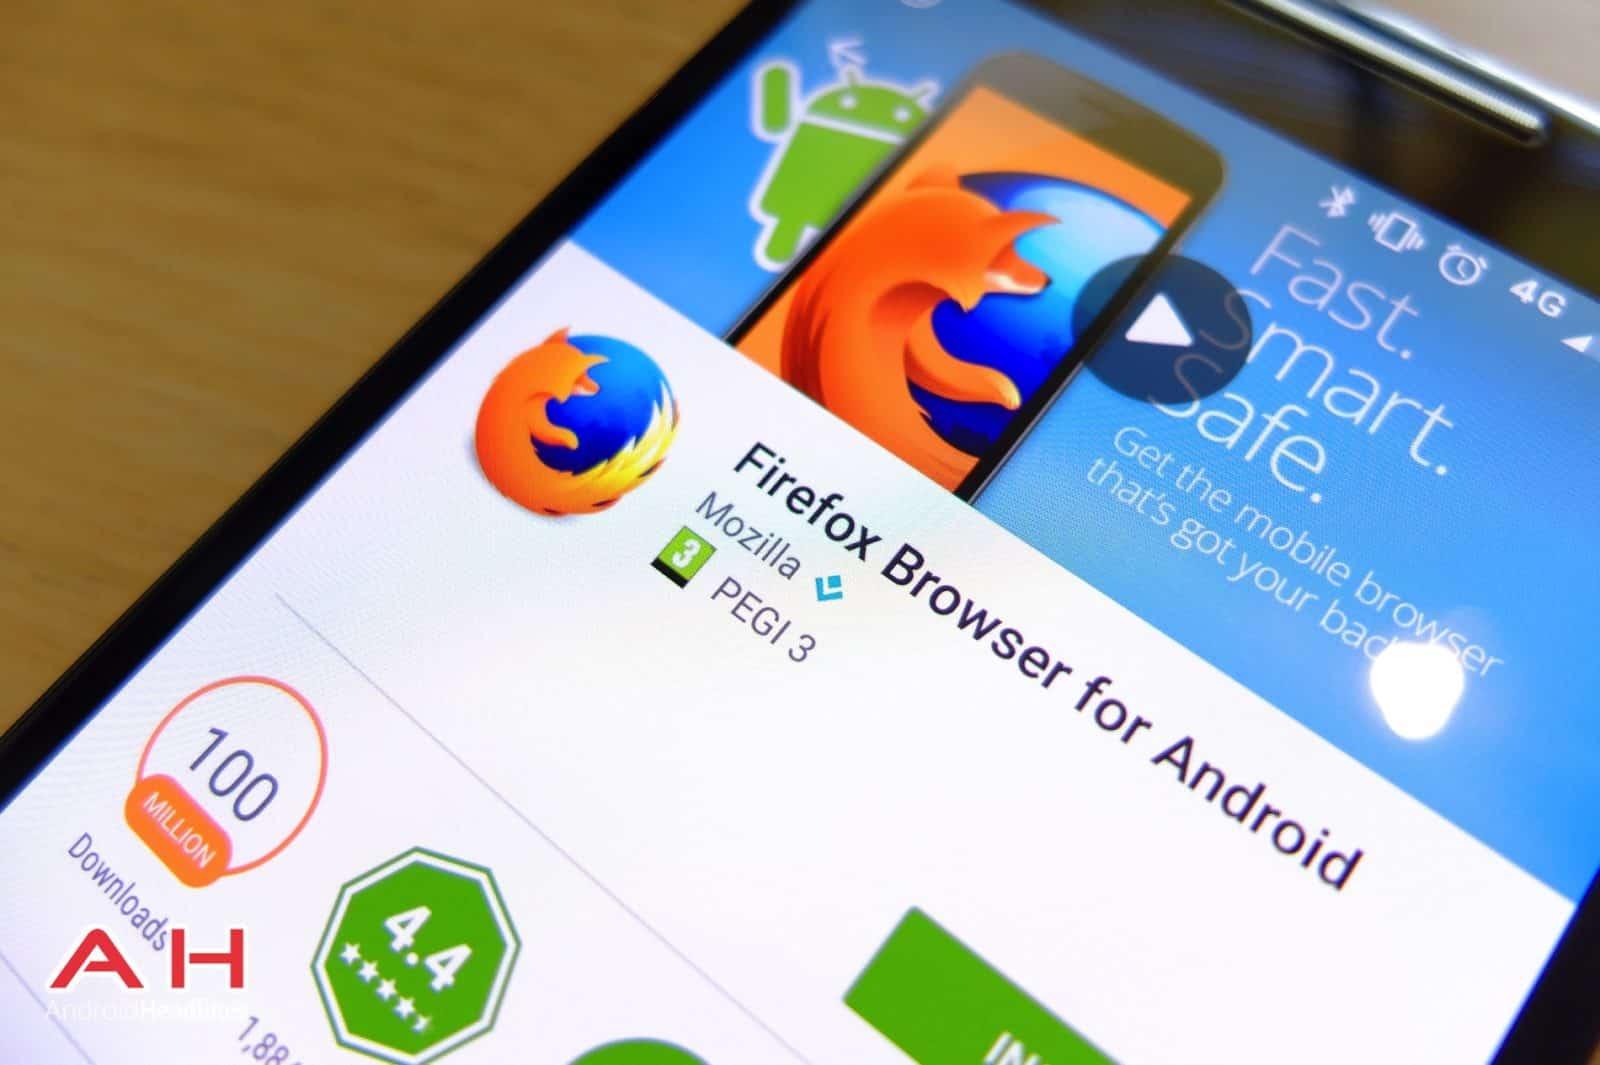 Firefox AH 01